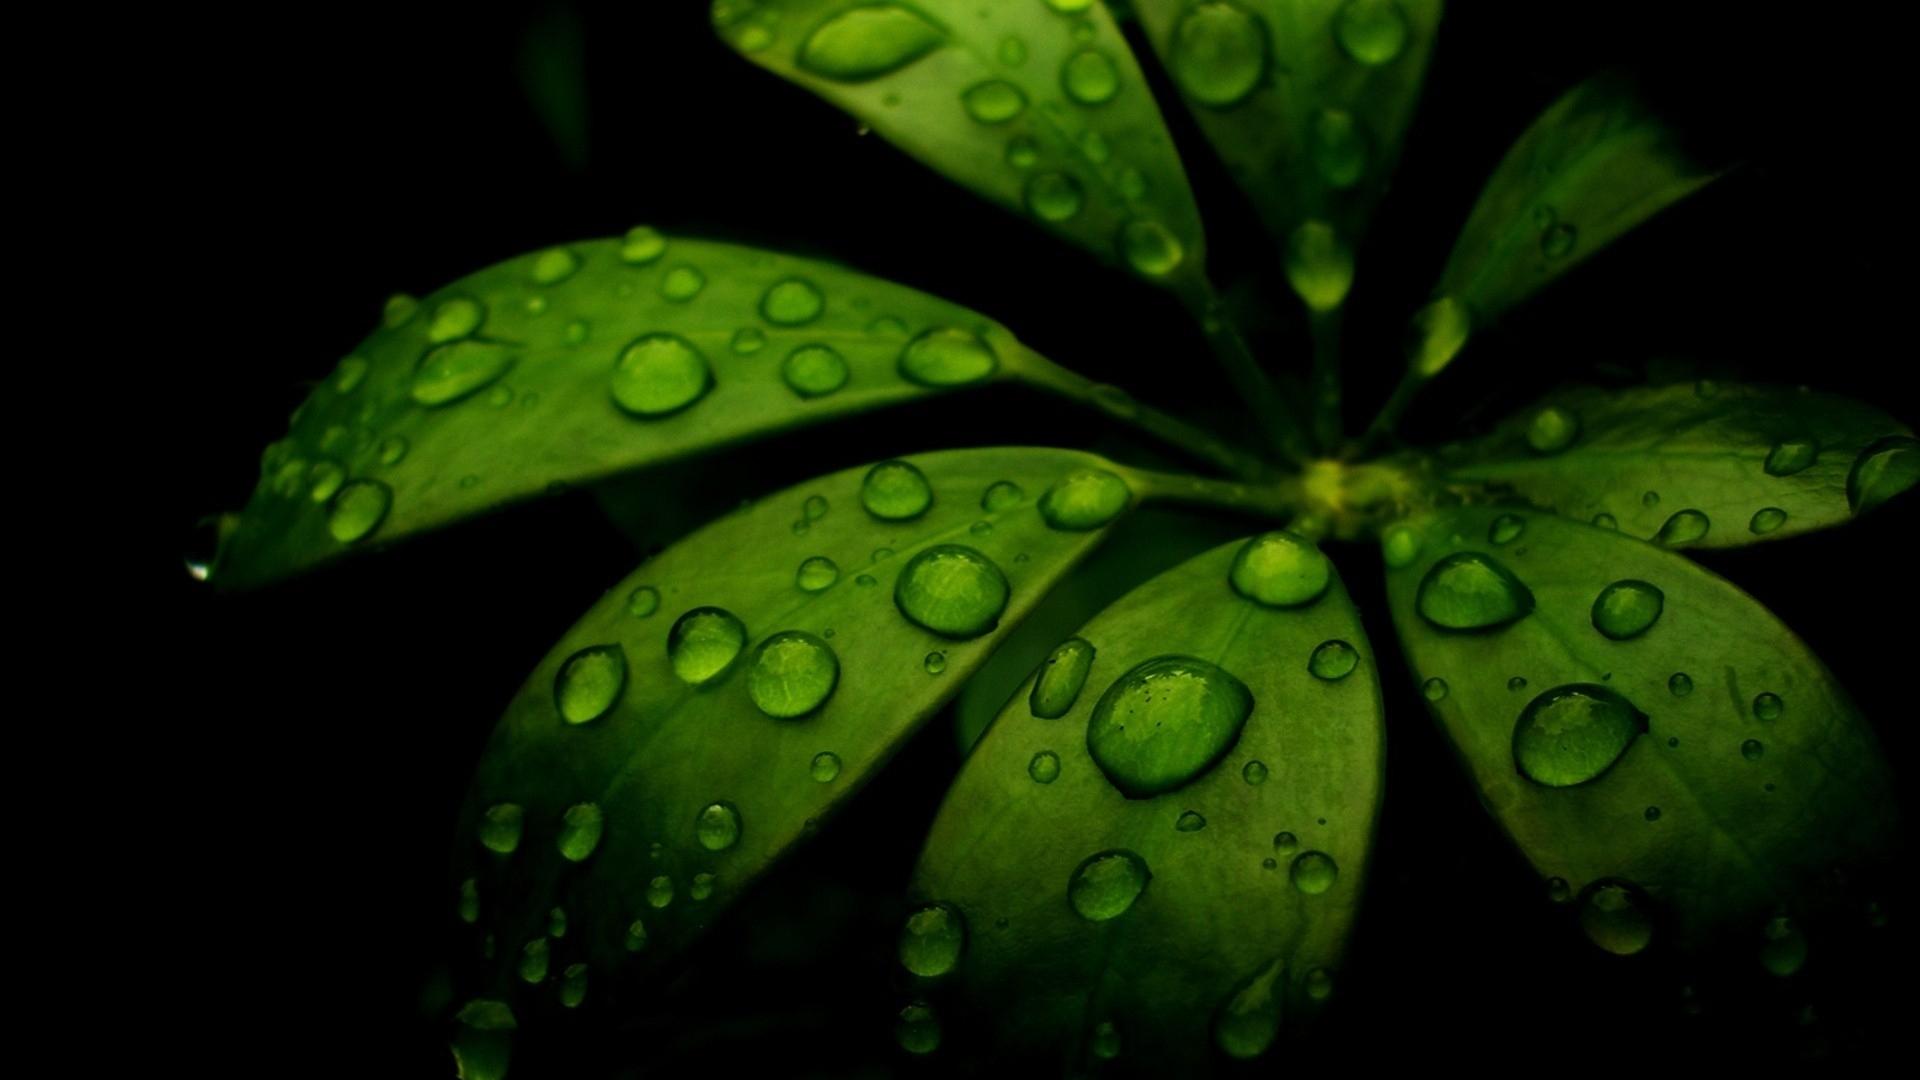 Download Wallpaper 1920x1080 Leaf Green Black Carved Full Hd 1080p Hd Background